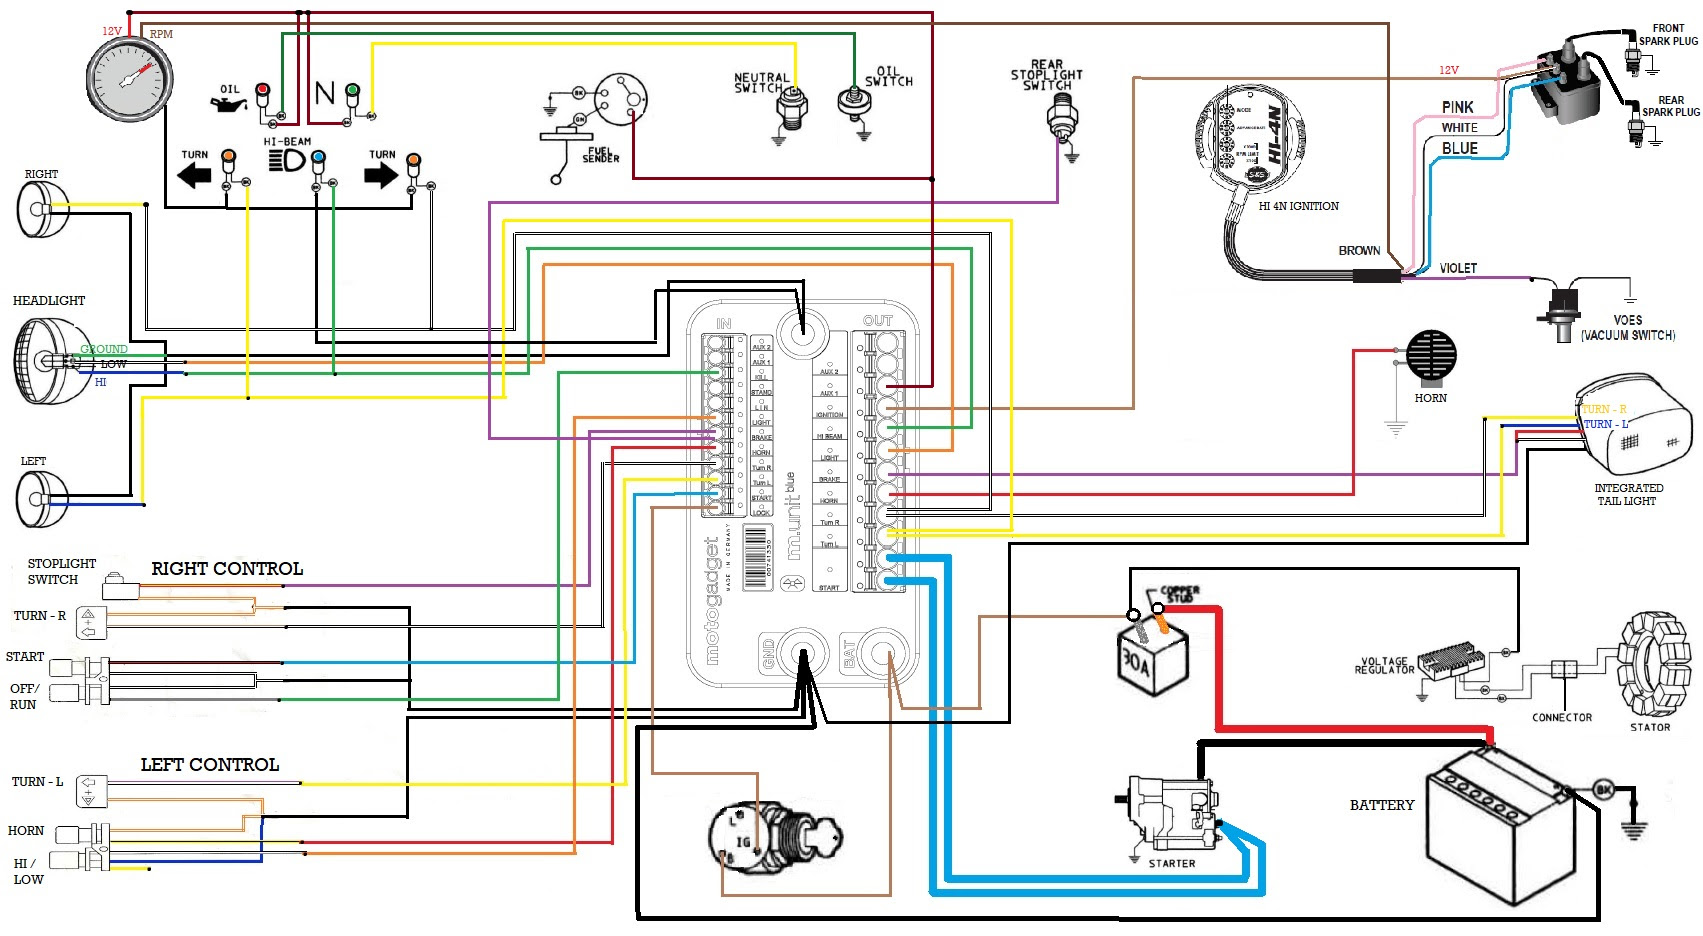 Diagram Suzuki Fxr 150 Wiring Diagram Full Version Hd Quality Wiring Diagram Biwiring2d Atuttasosta It